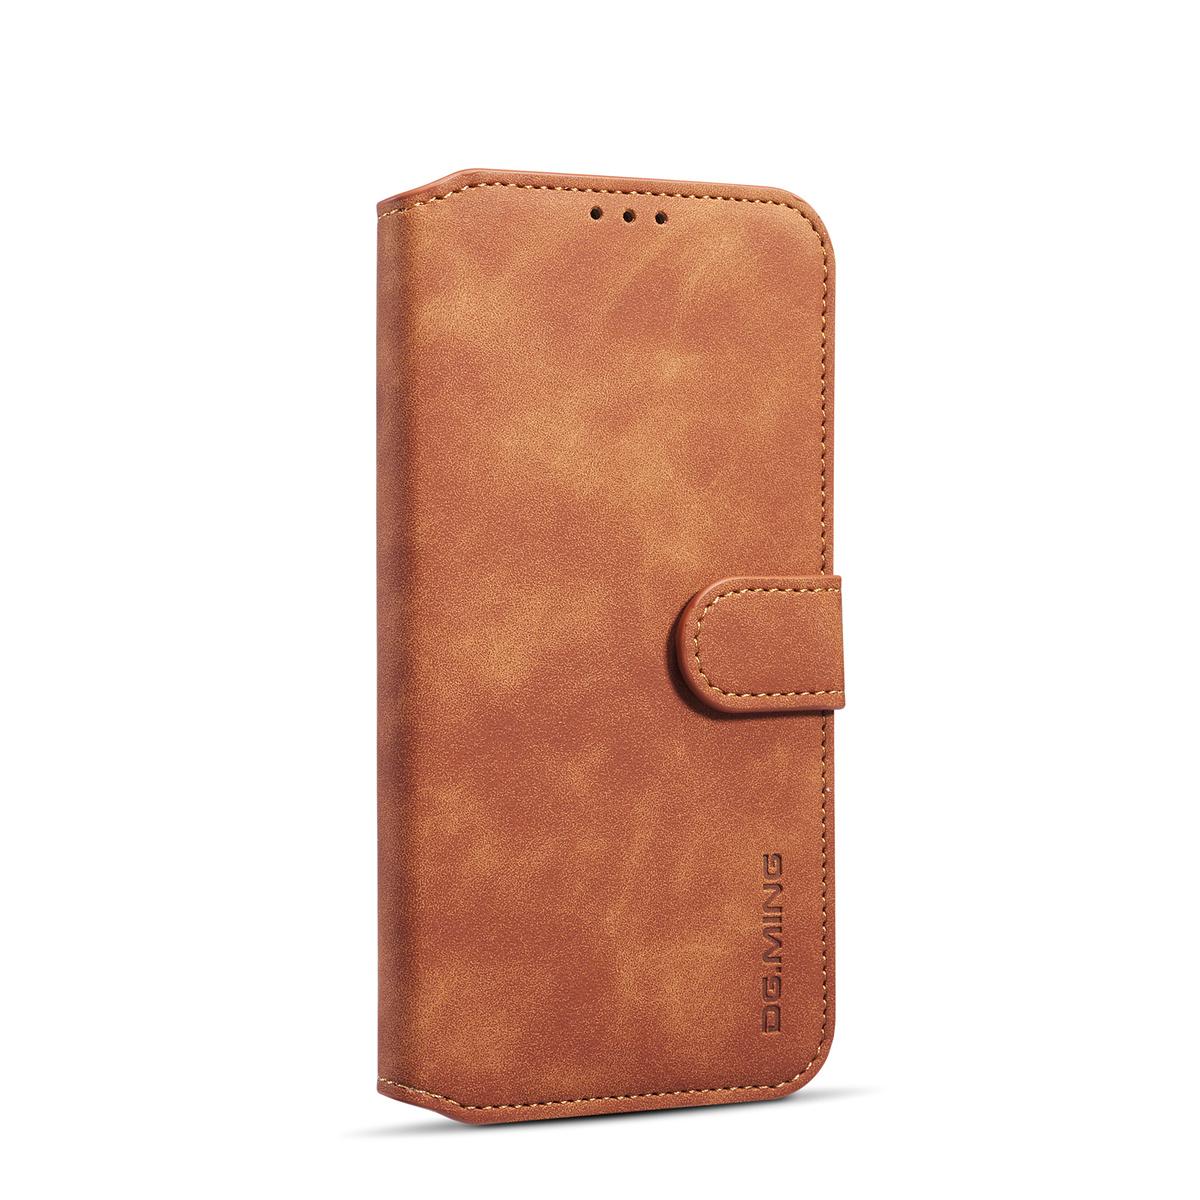 DG.MING Retro fodral, ställ, kortplats, iPhone XR, brun